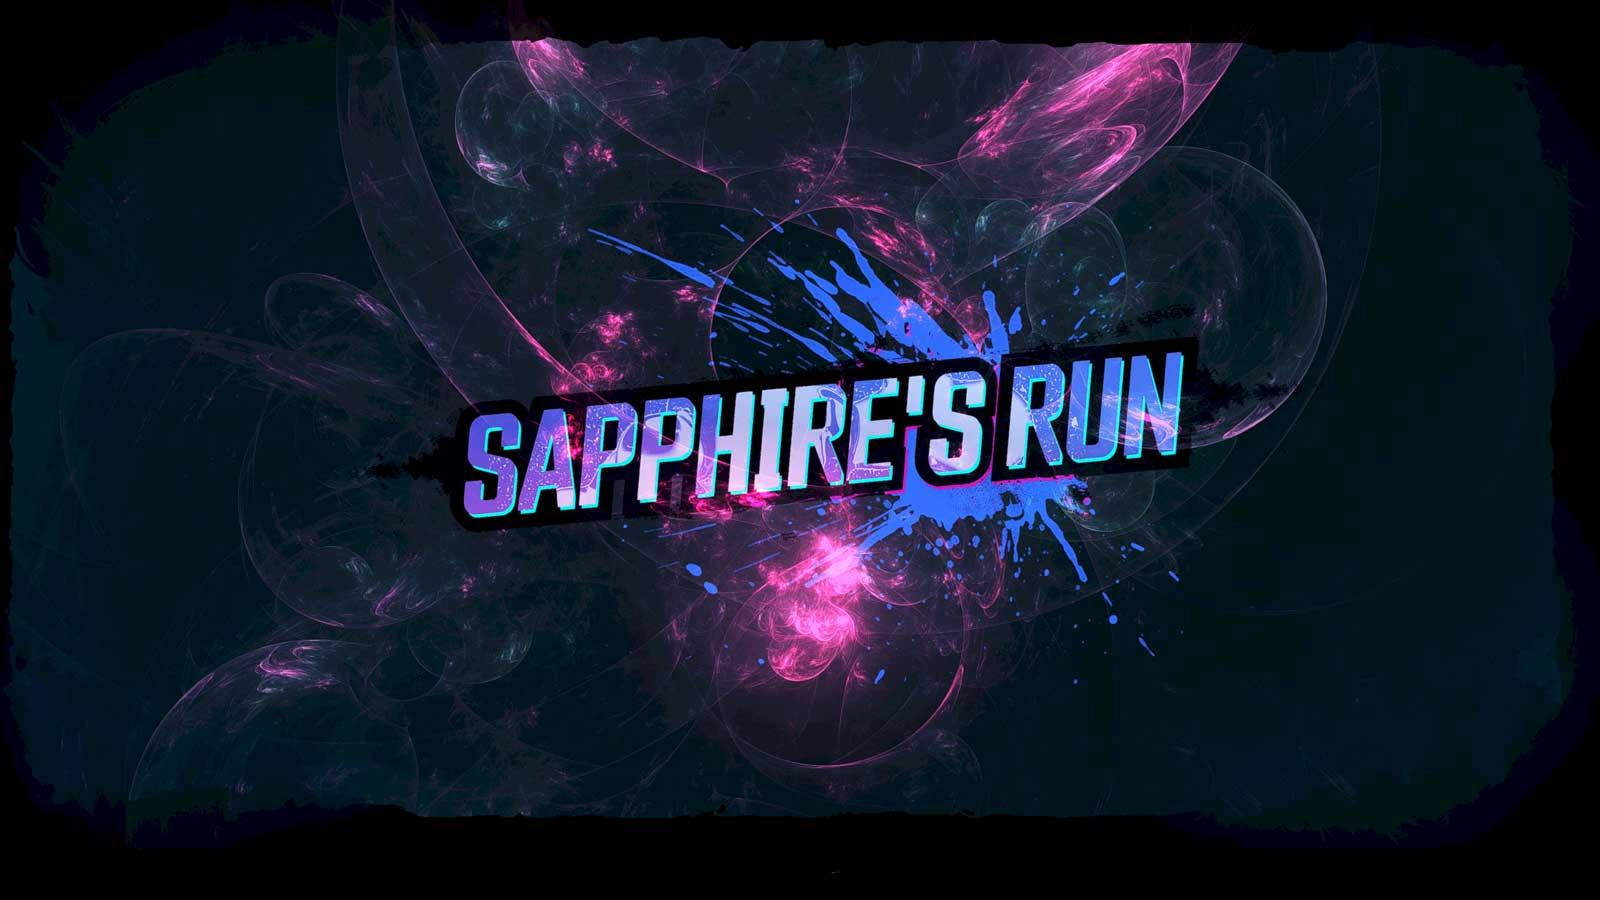 Sapphire's Run